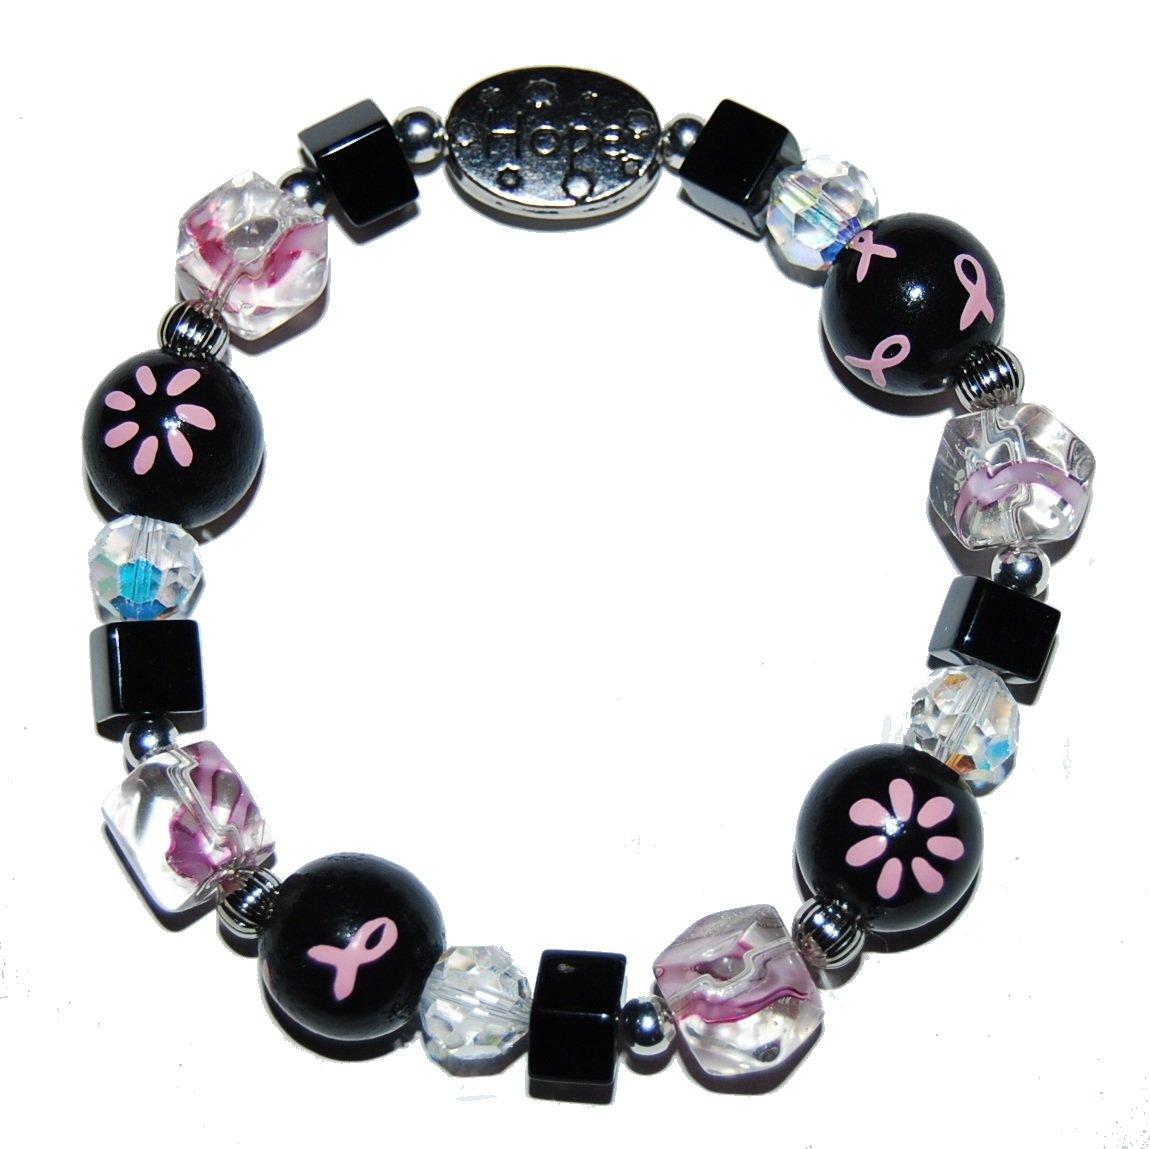 Hand-painted Pink & Black Ribbon Breast Cancer Awareness Stretch Bracelet